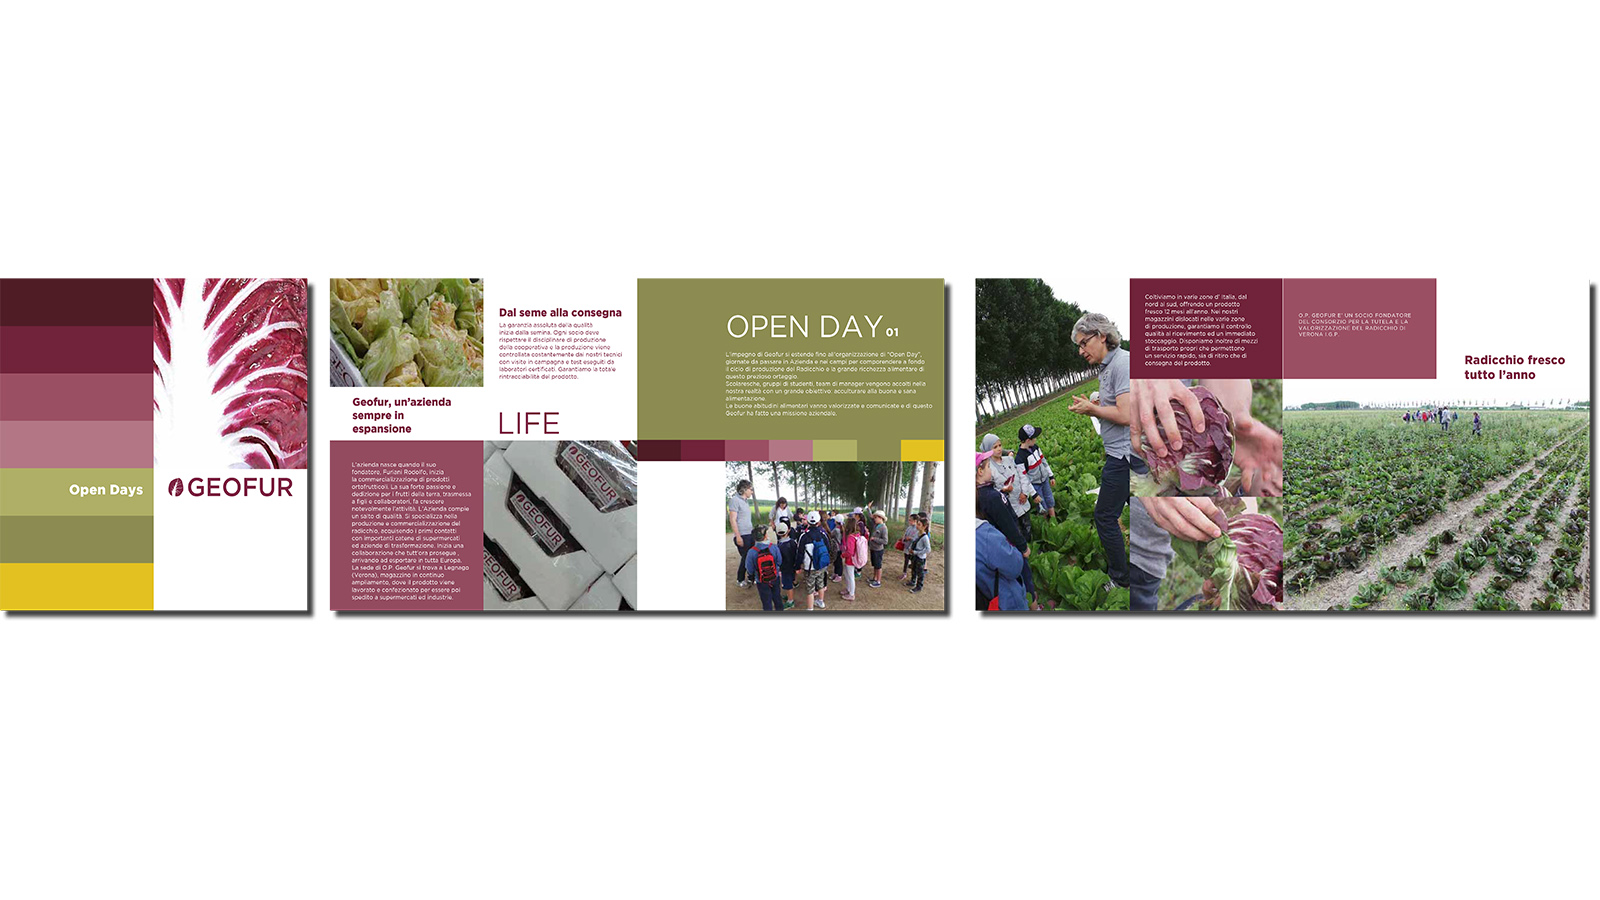 geofur-consulenza-globale-open-day